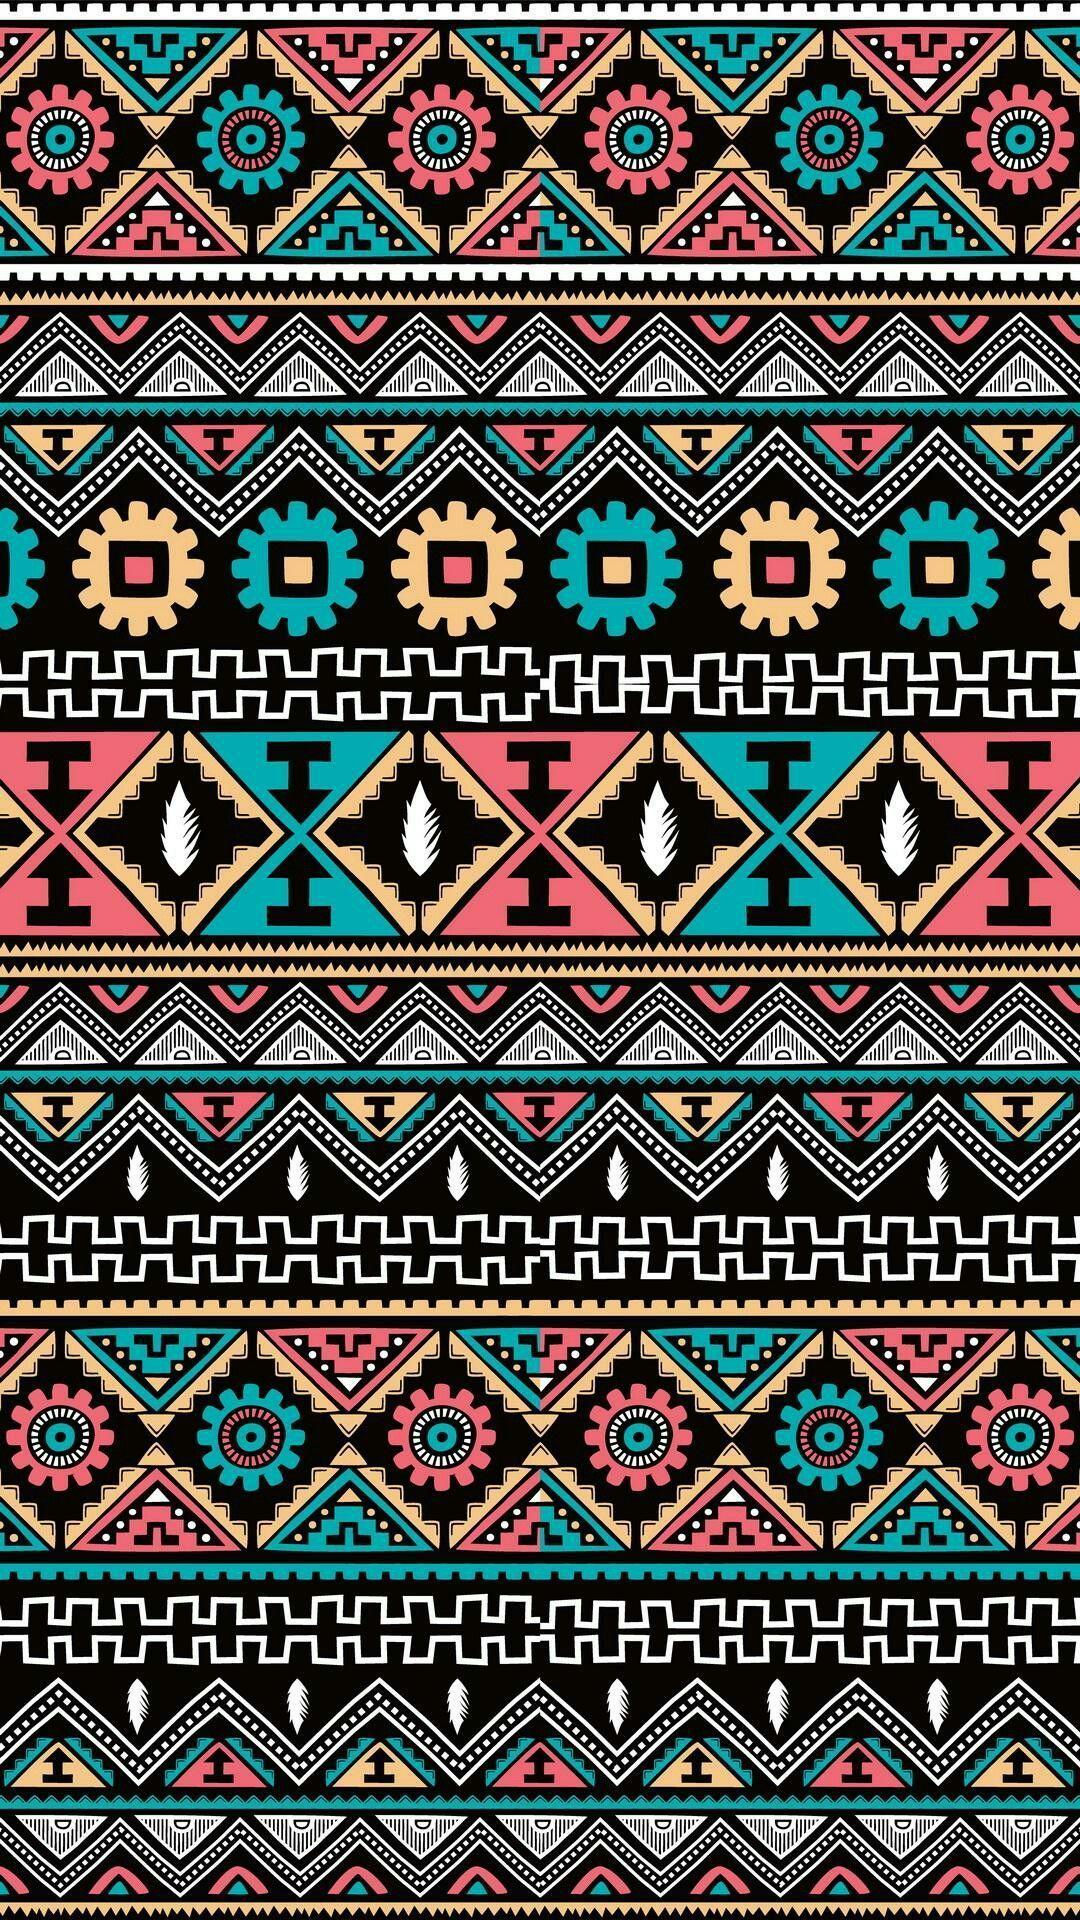 Cute Aztec Tribal Wallpapers - Top Free Cute Aztec Tribal ...